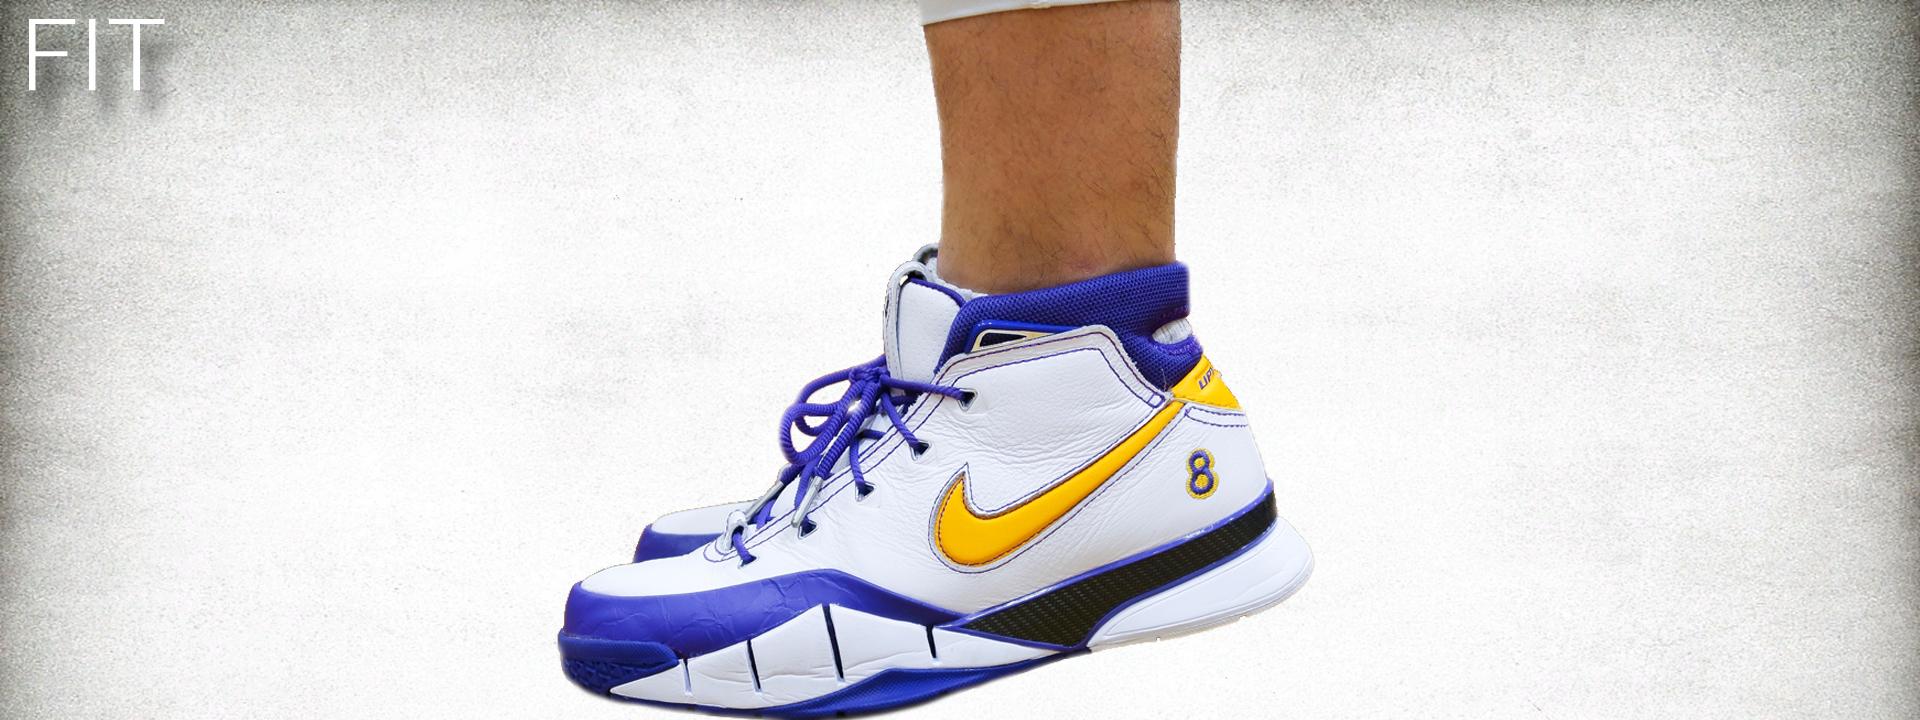 Nike Kobe 1 Protro Performance Review